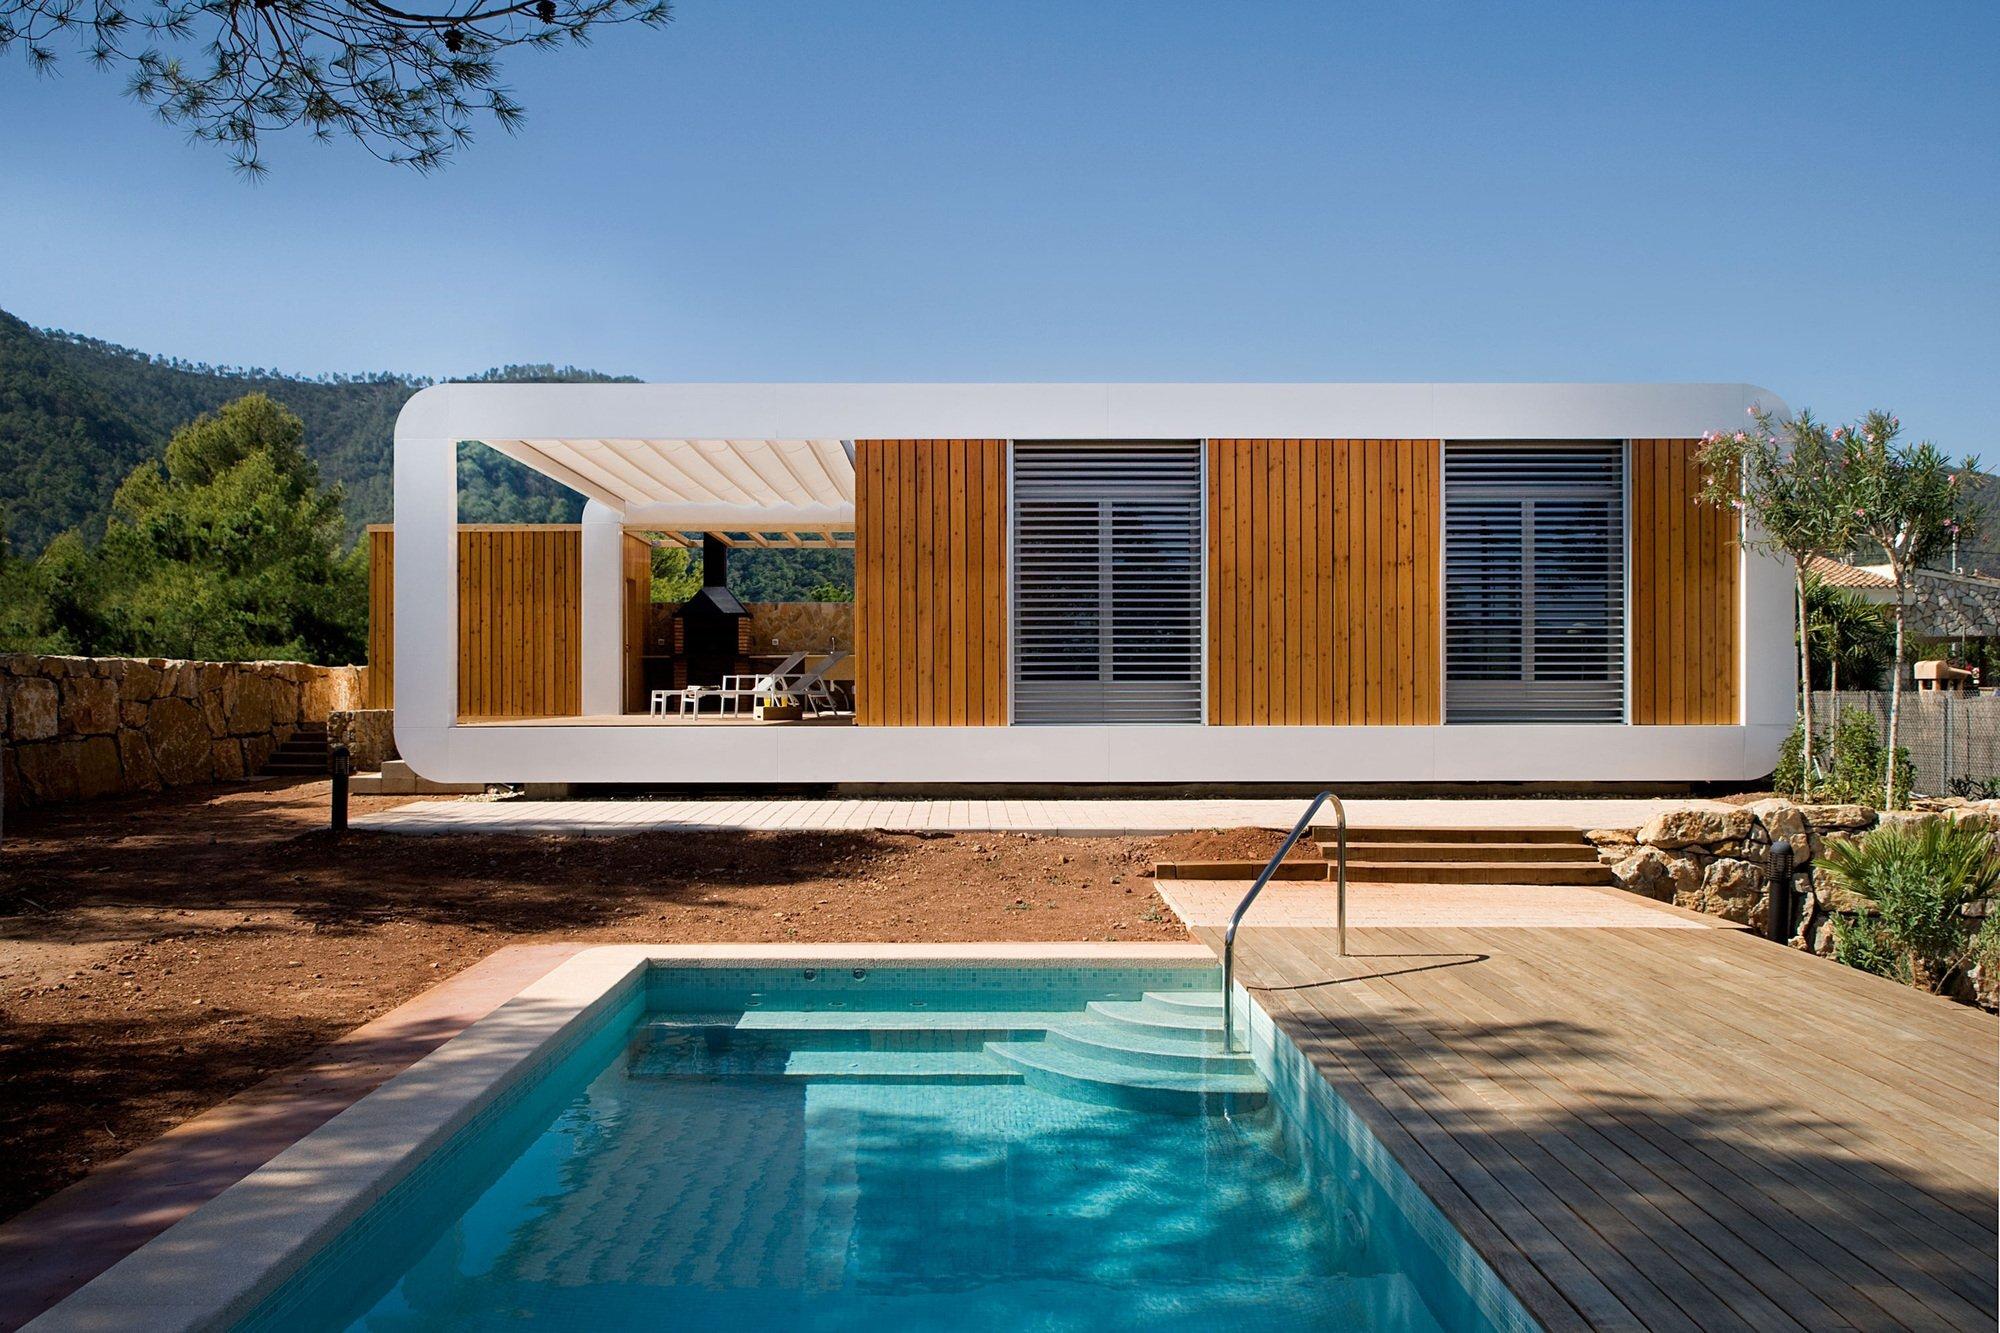 the prefab bioclimatic house